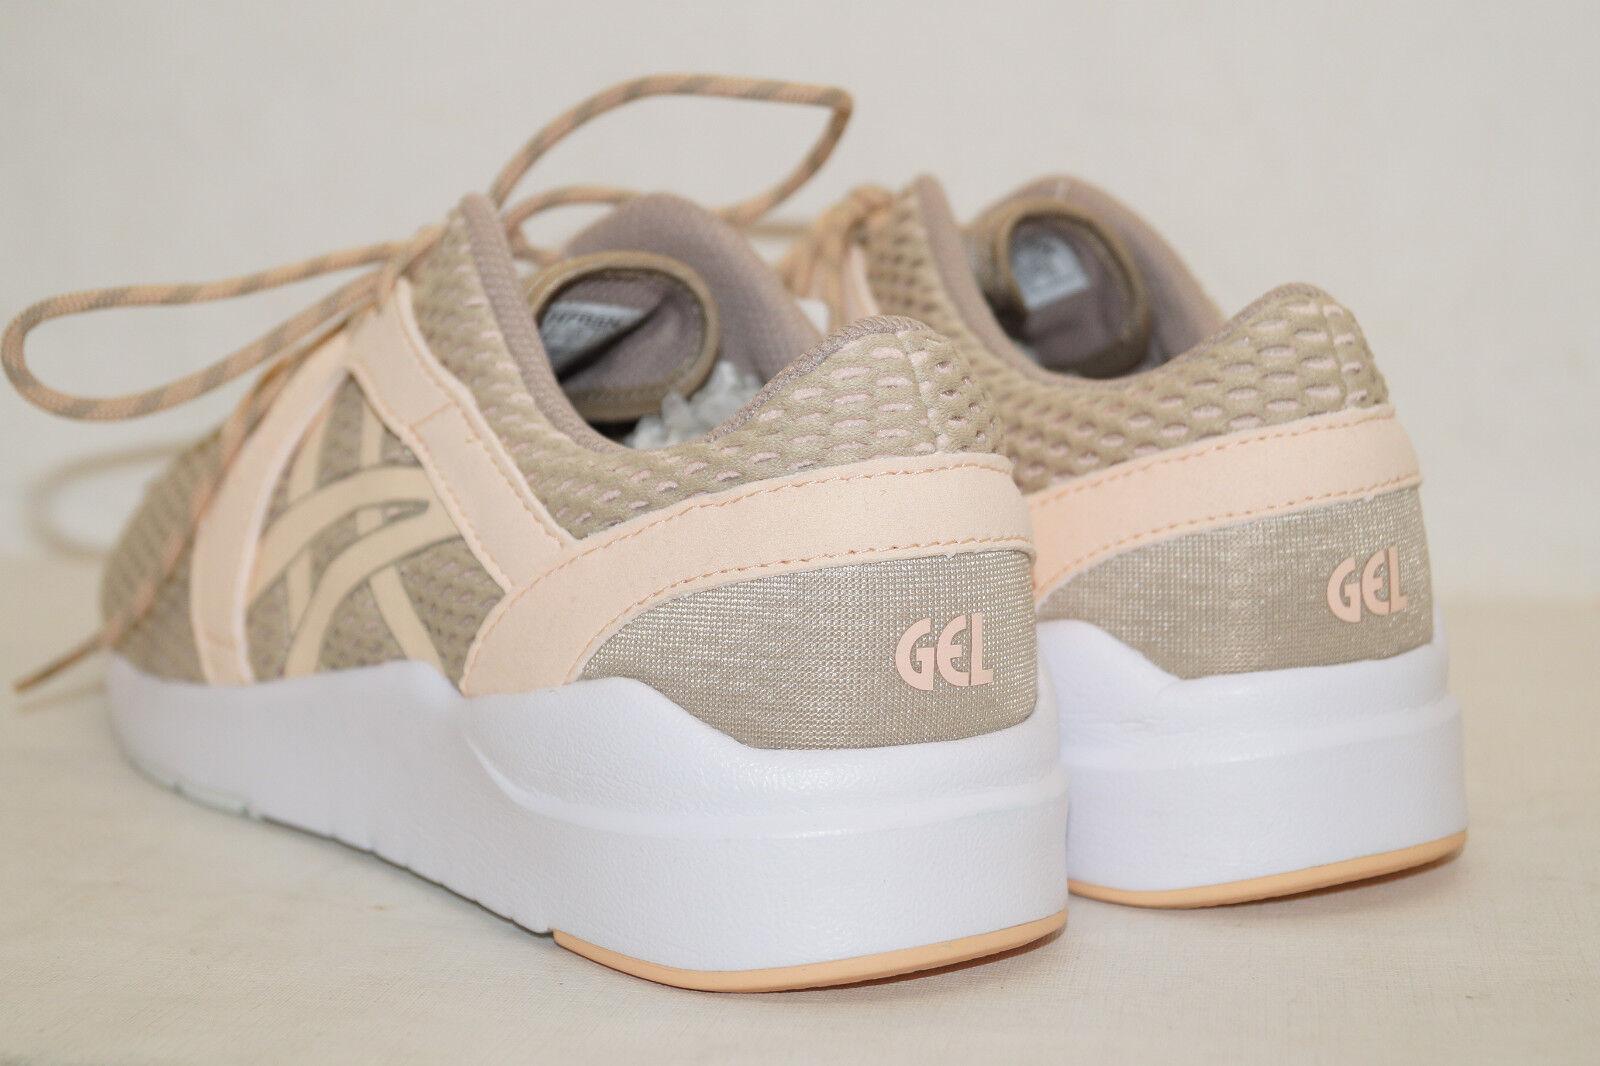 big sale edf14 c9ab8 ... New Adidas AdiZero Approach Tennis Shoe CQ1855   White  55  55  55  6a6ad9 ...